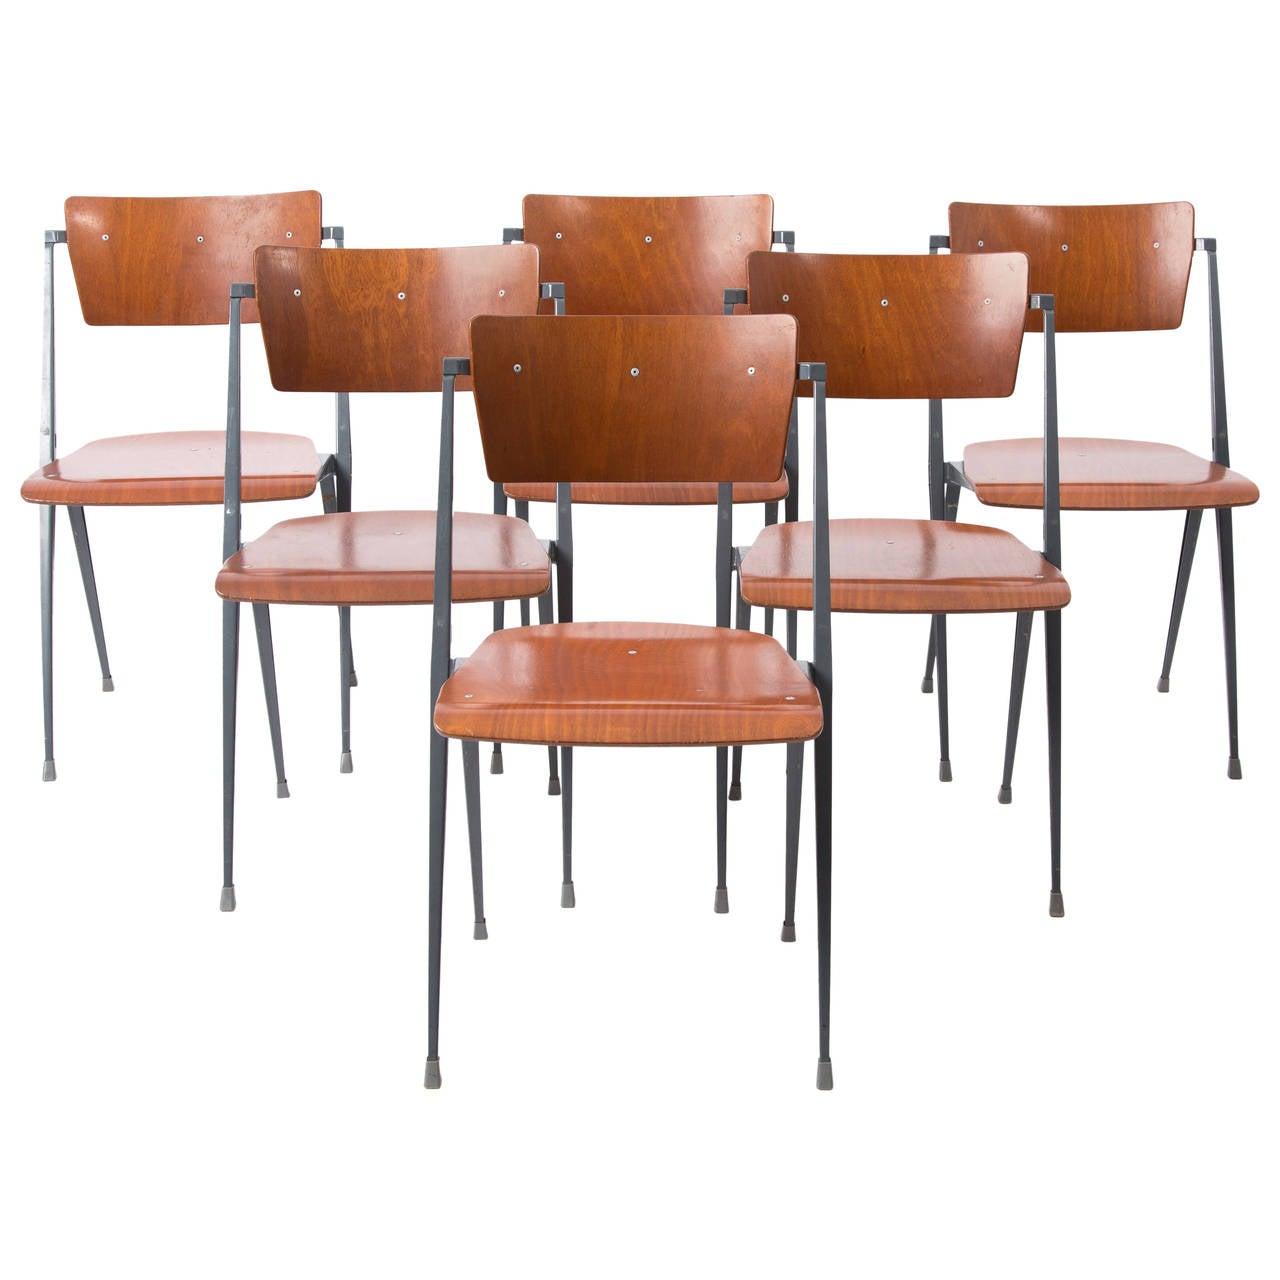 Wim Rietveld Pyramide Ahrend de Cirkel Chairs